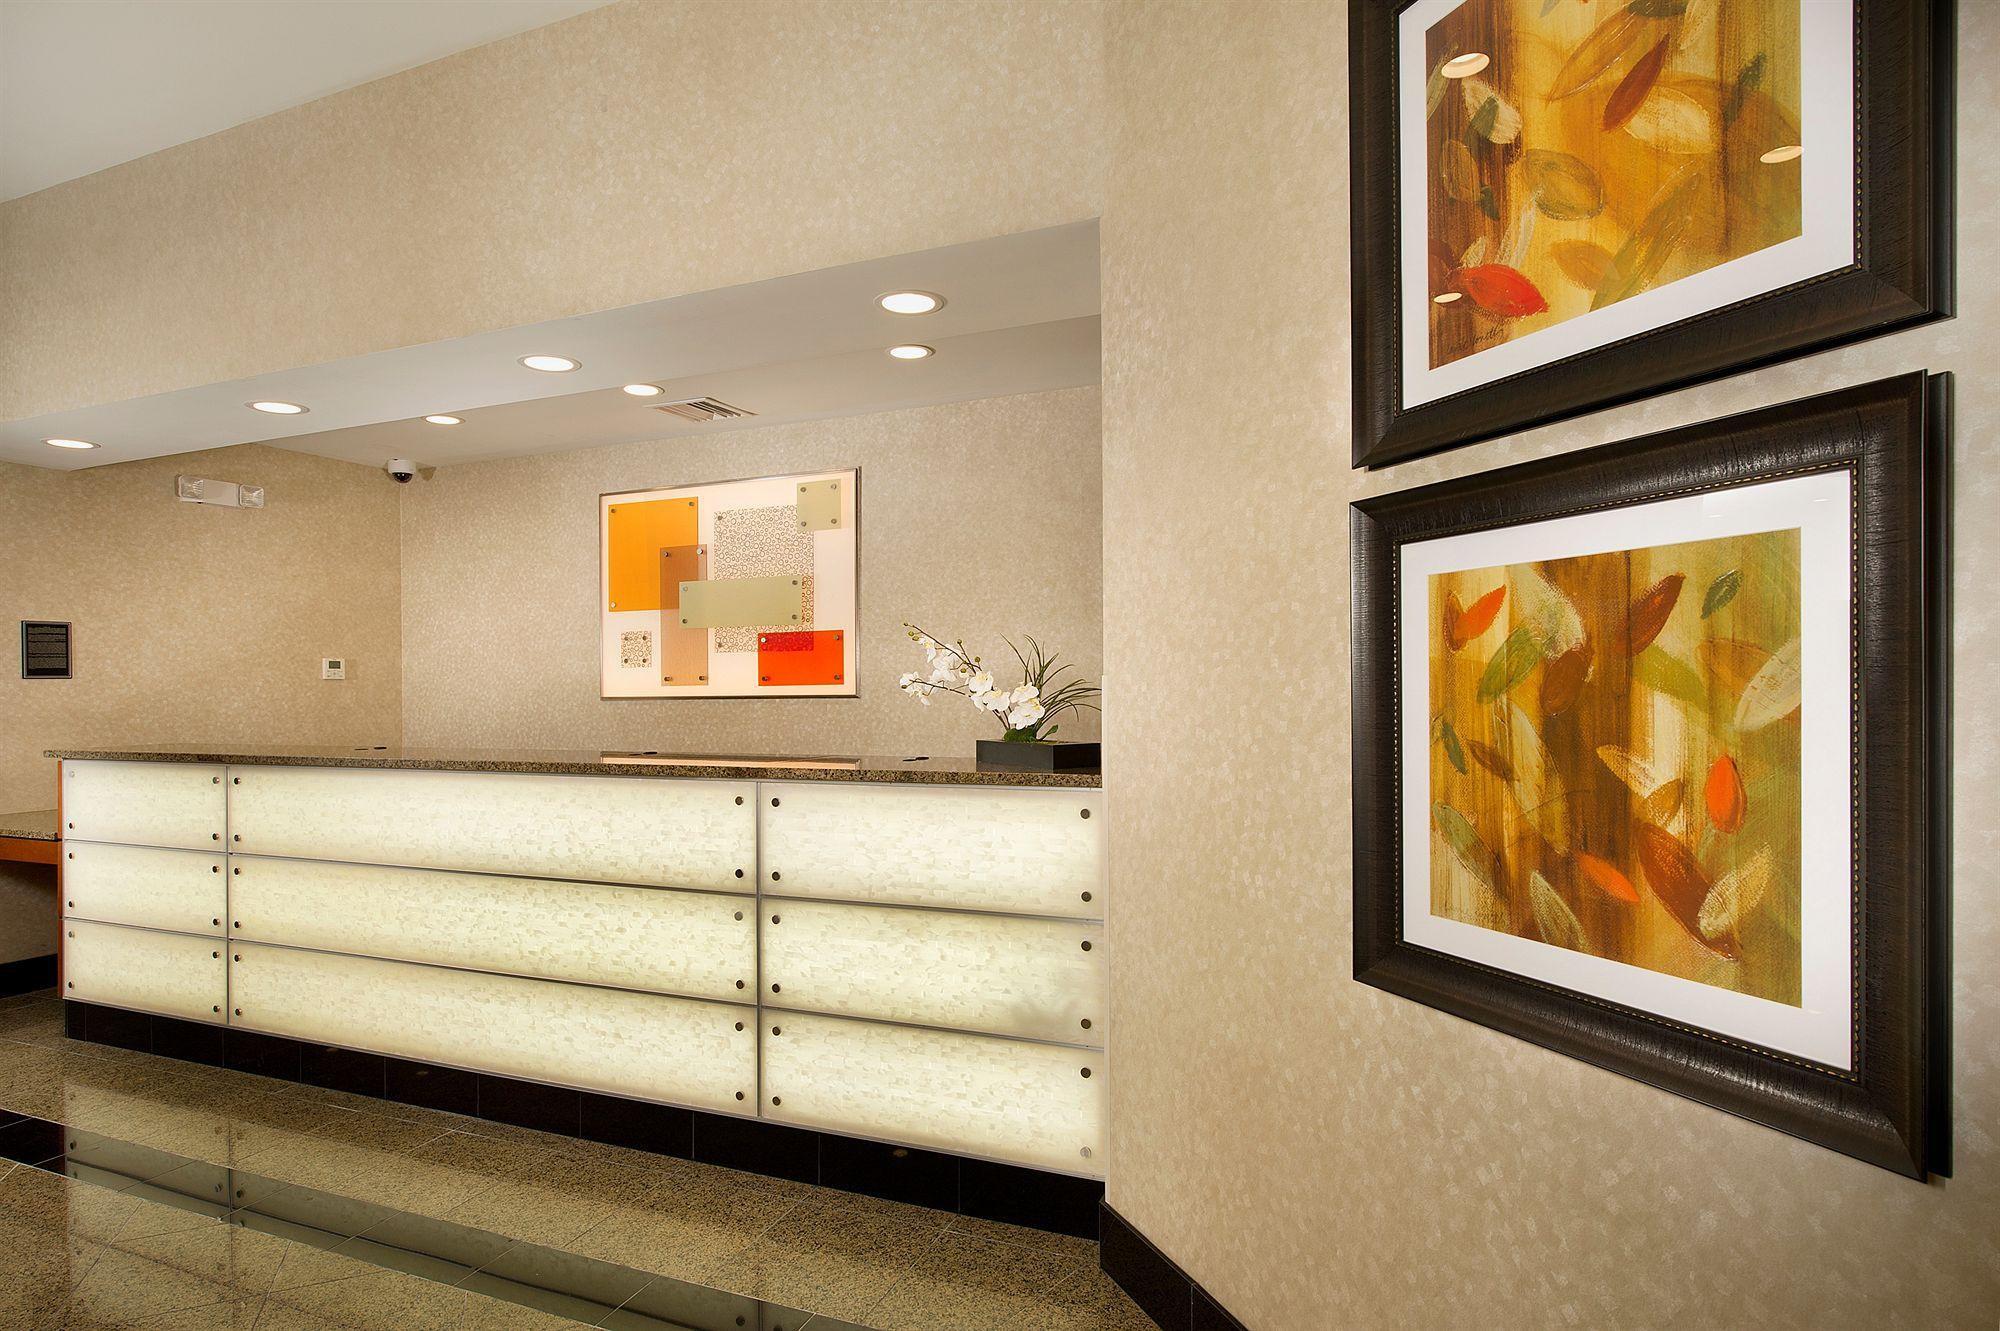 Drury Inn Suites Valdosta